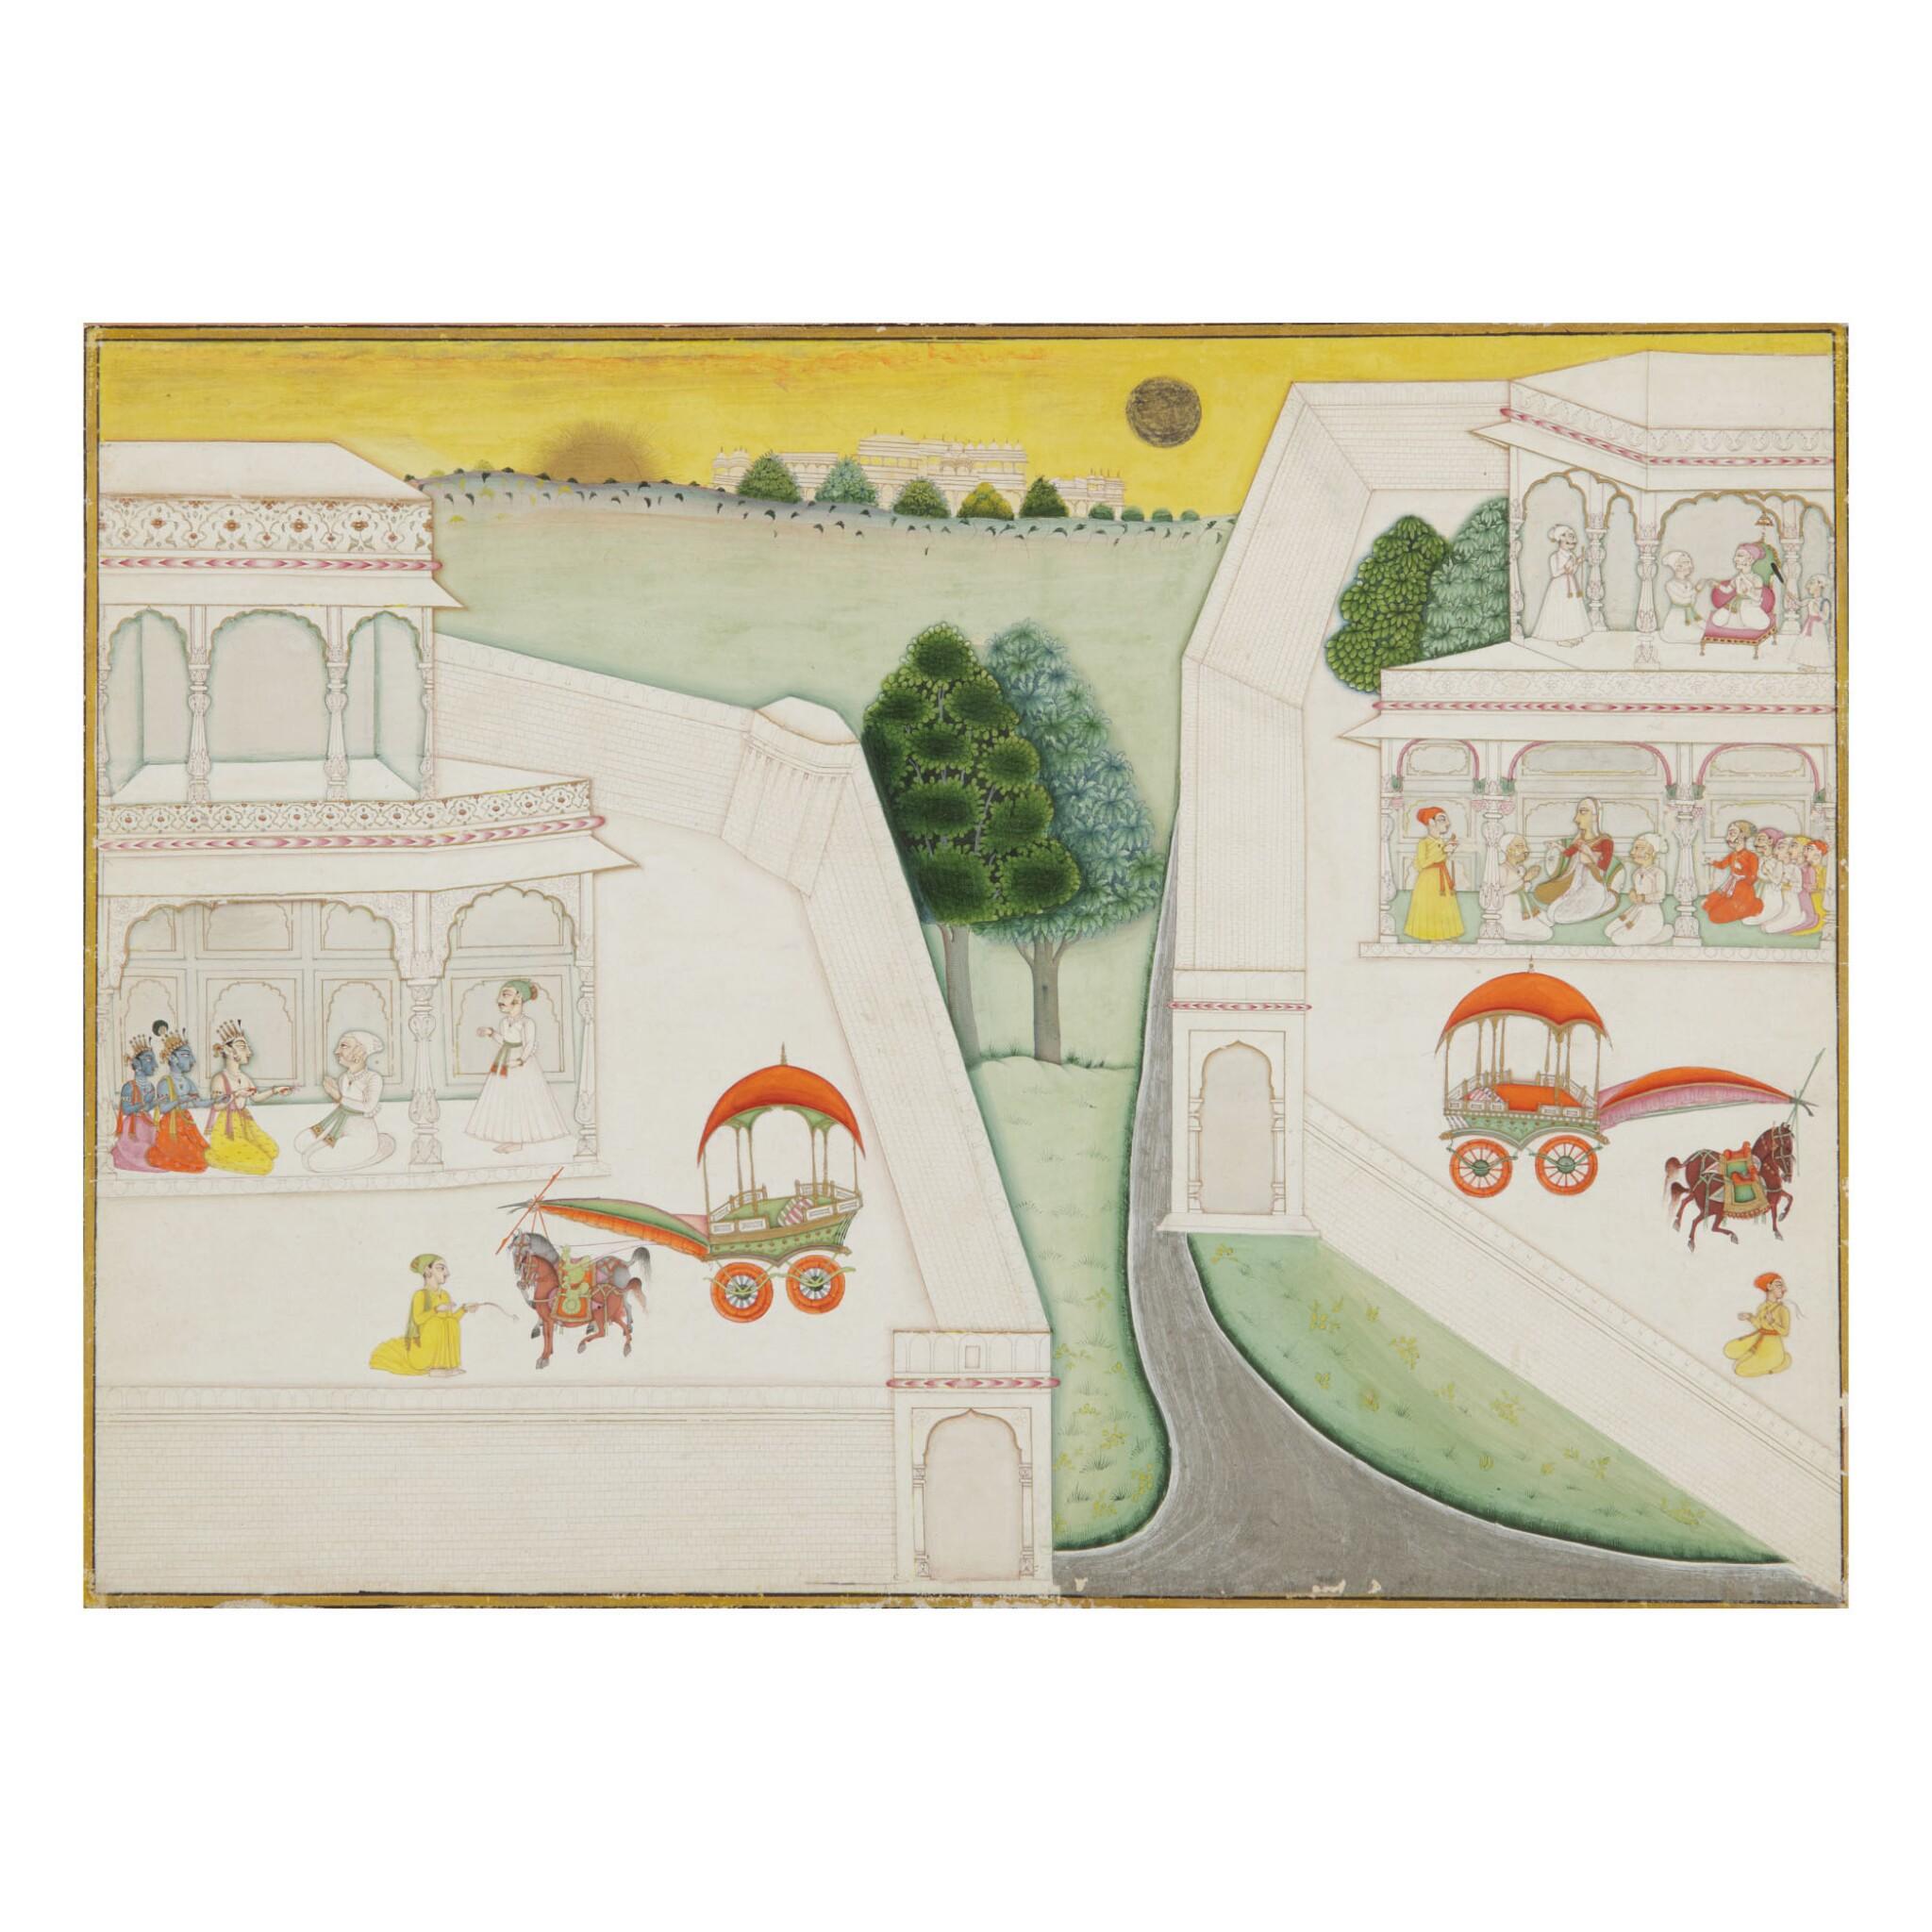 View full screen - View 1 of Lot 367. AN ILLUSTRATION TO A BHAGAVATA PURANA SERIES: AKRURA TRAVELS TO HASTINAPURA TO MEET KUNTI,  BIKANER, INDIA, CIRCA 1690-1710.